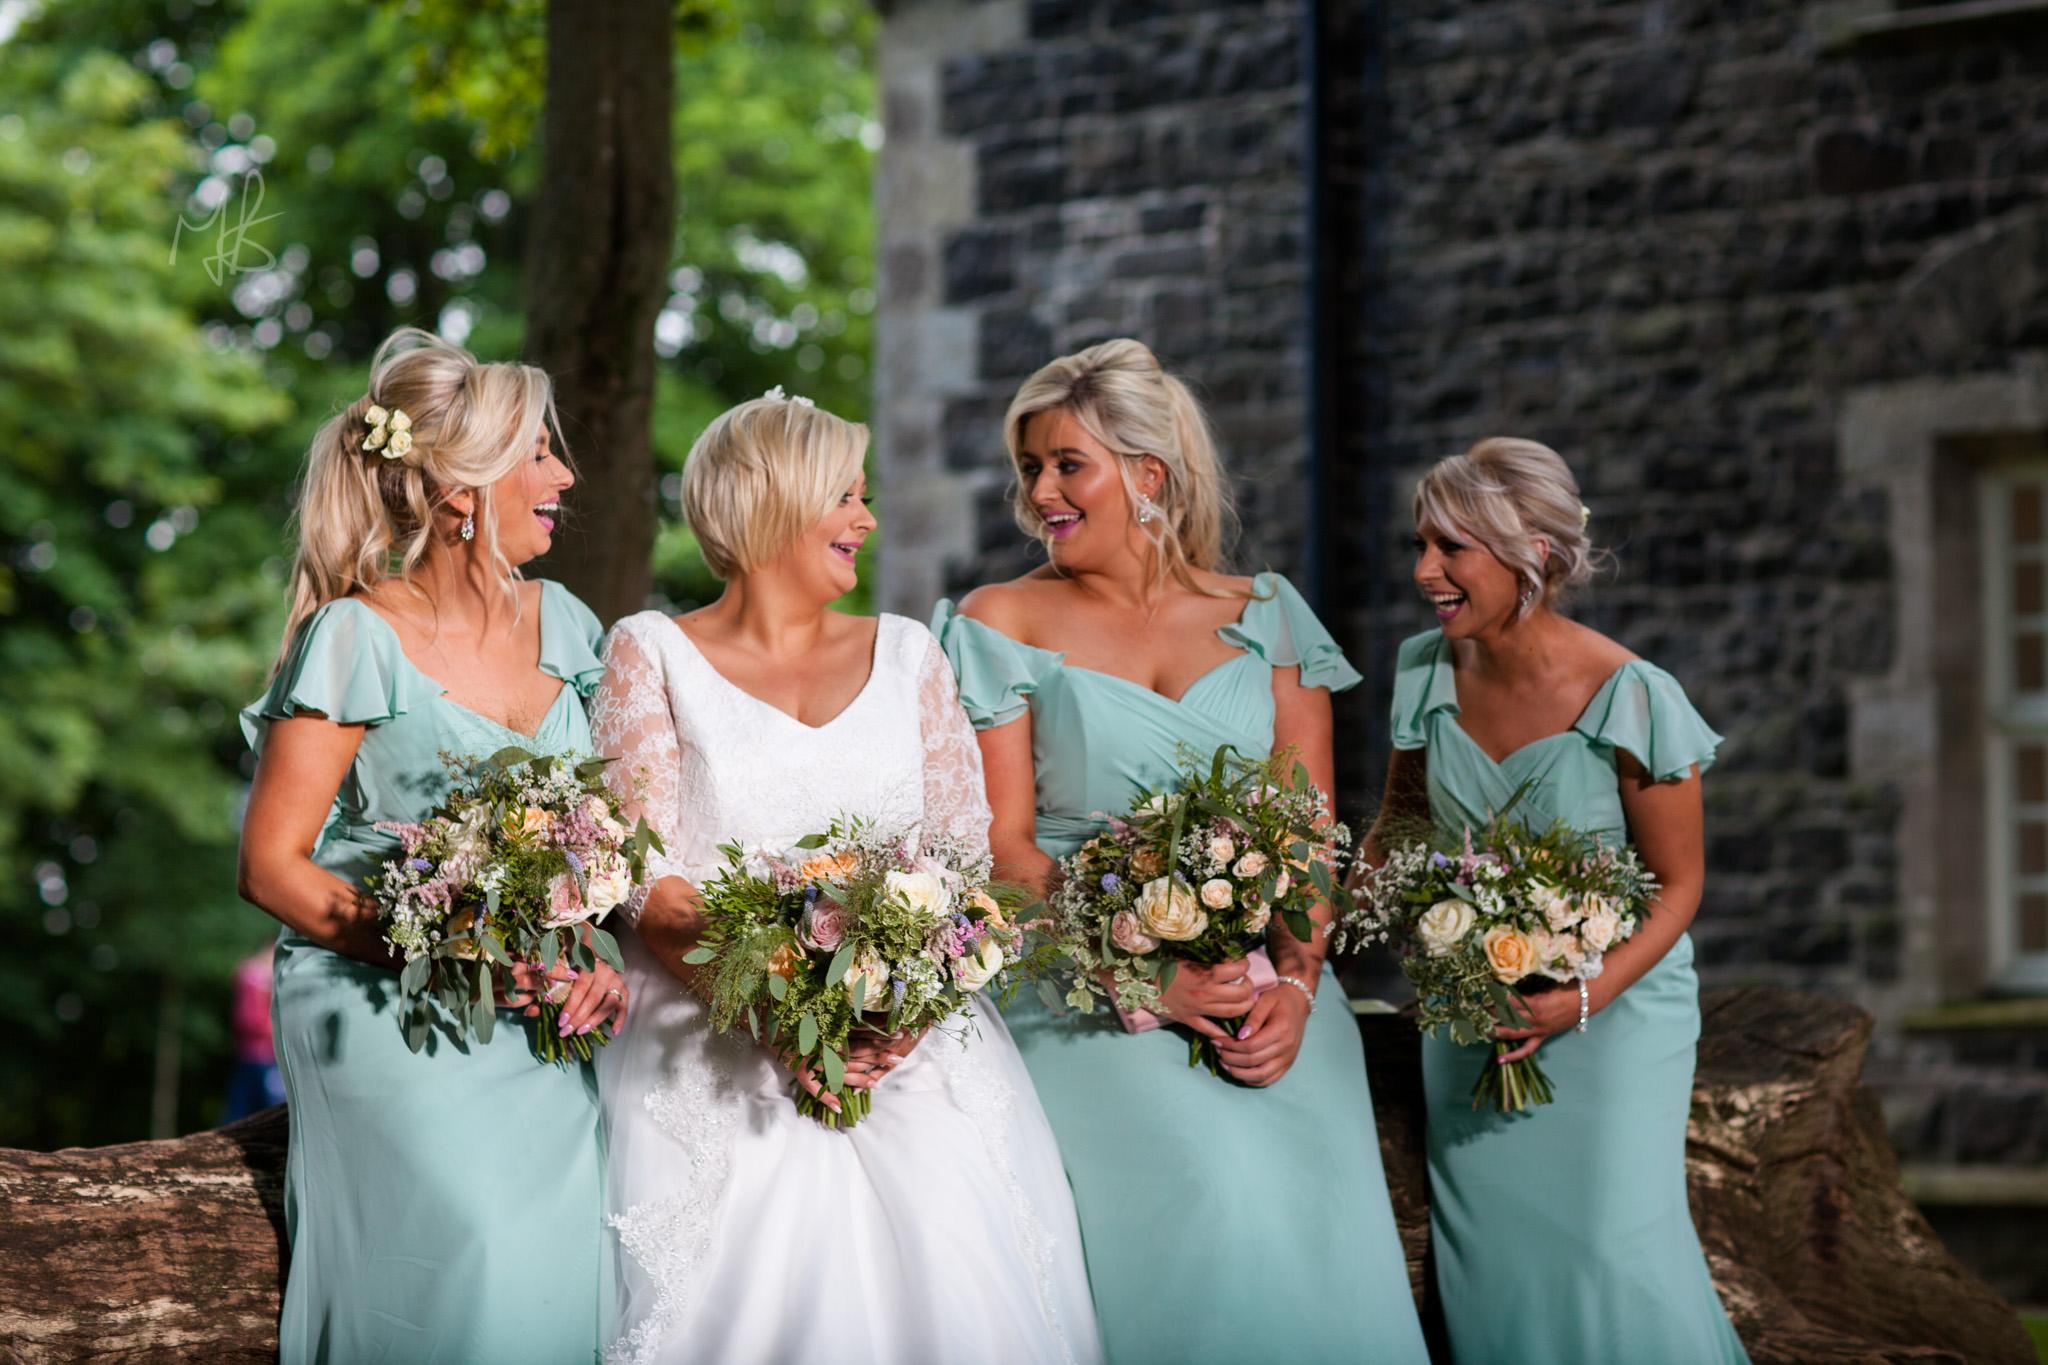 Northern-Ireland-Wedding-Photographer-Mark-Barnes-Ballymena_wedding-photography-Leighinmohr-House-Seamas_Alanna_For-web-33.jpg